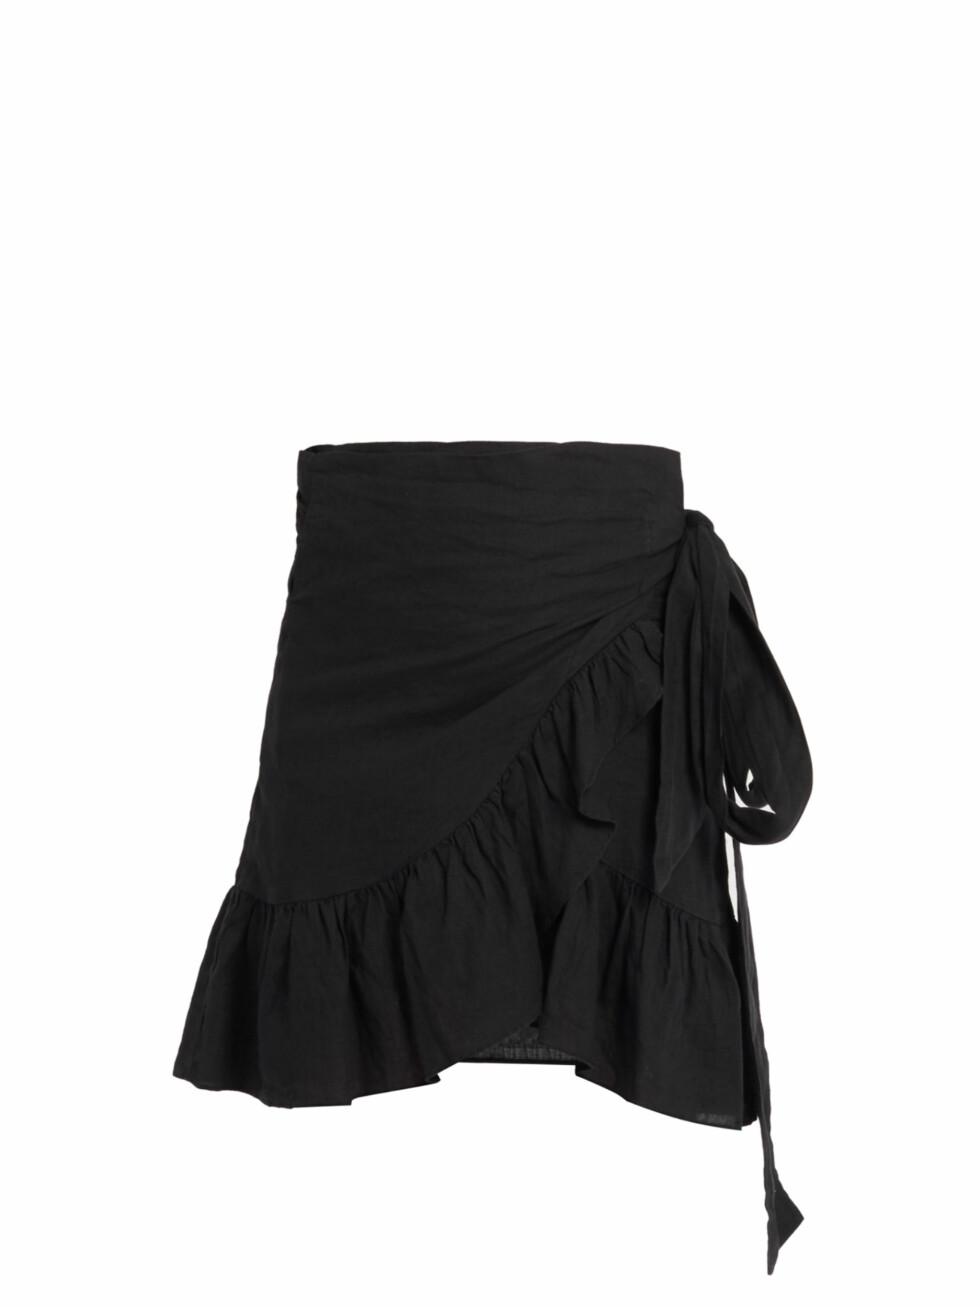 Skjørt fra Isabel Marant via Matchesfashion.com | kr 1720 | http://www.matchesfashion.com/intl/products/Isabel-Marant-%C3%89toile-Dempster-ruffled-mini-skirt-1073783